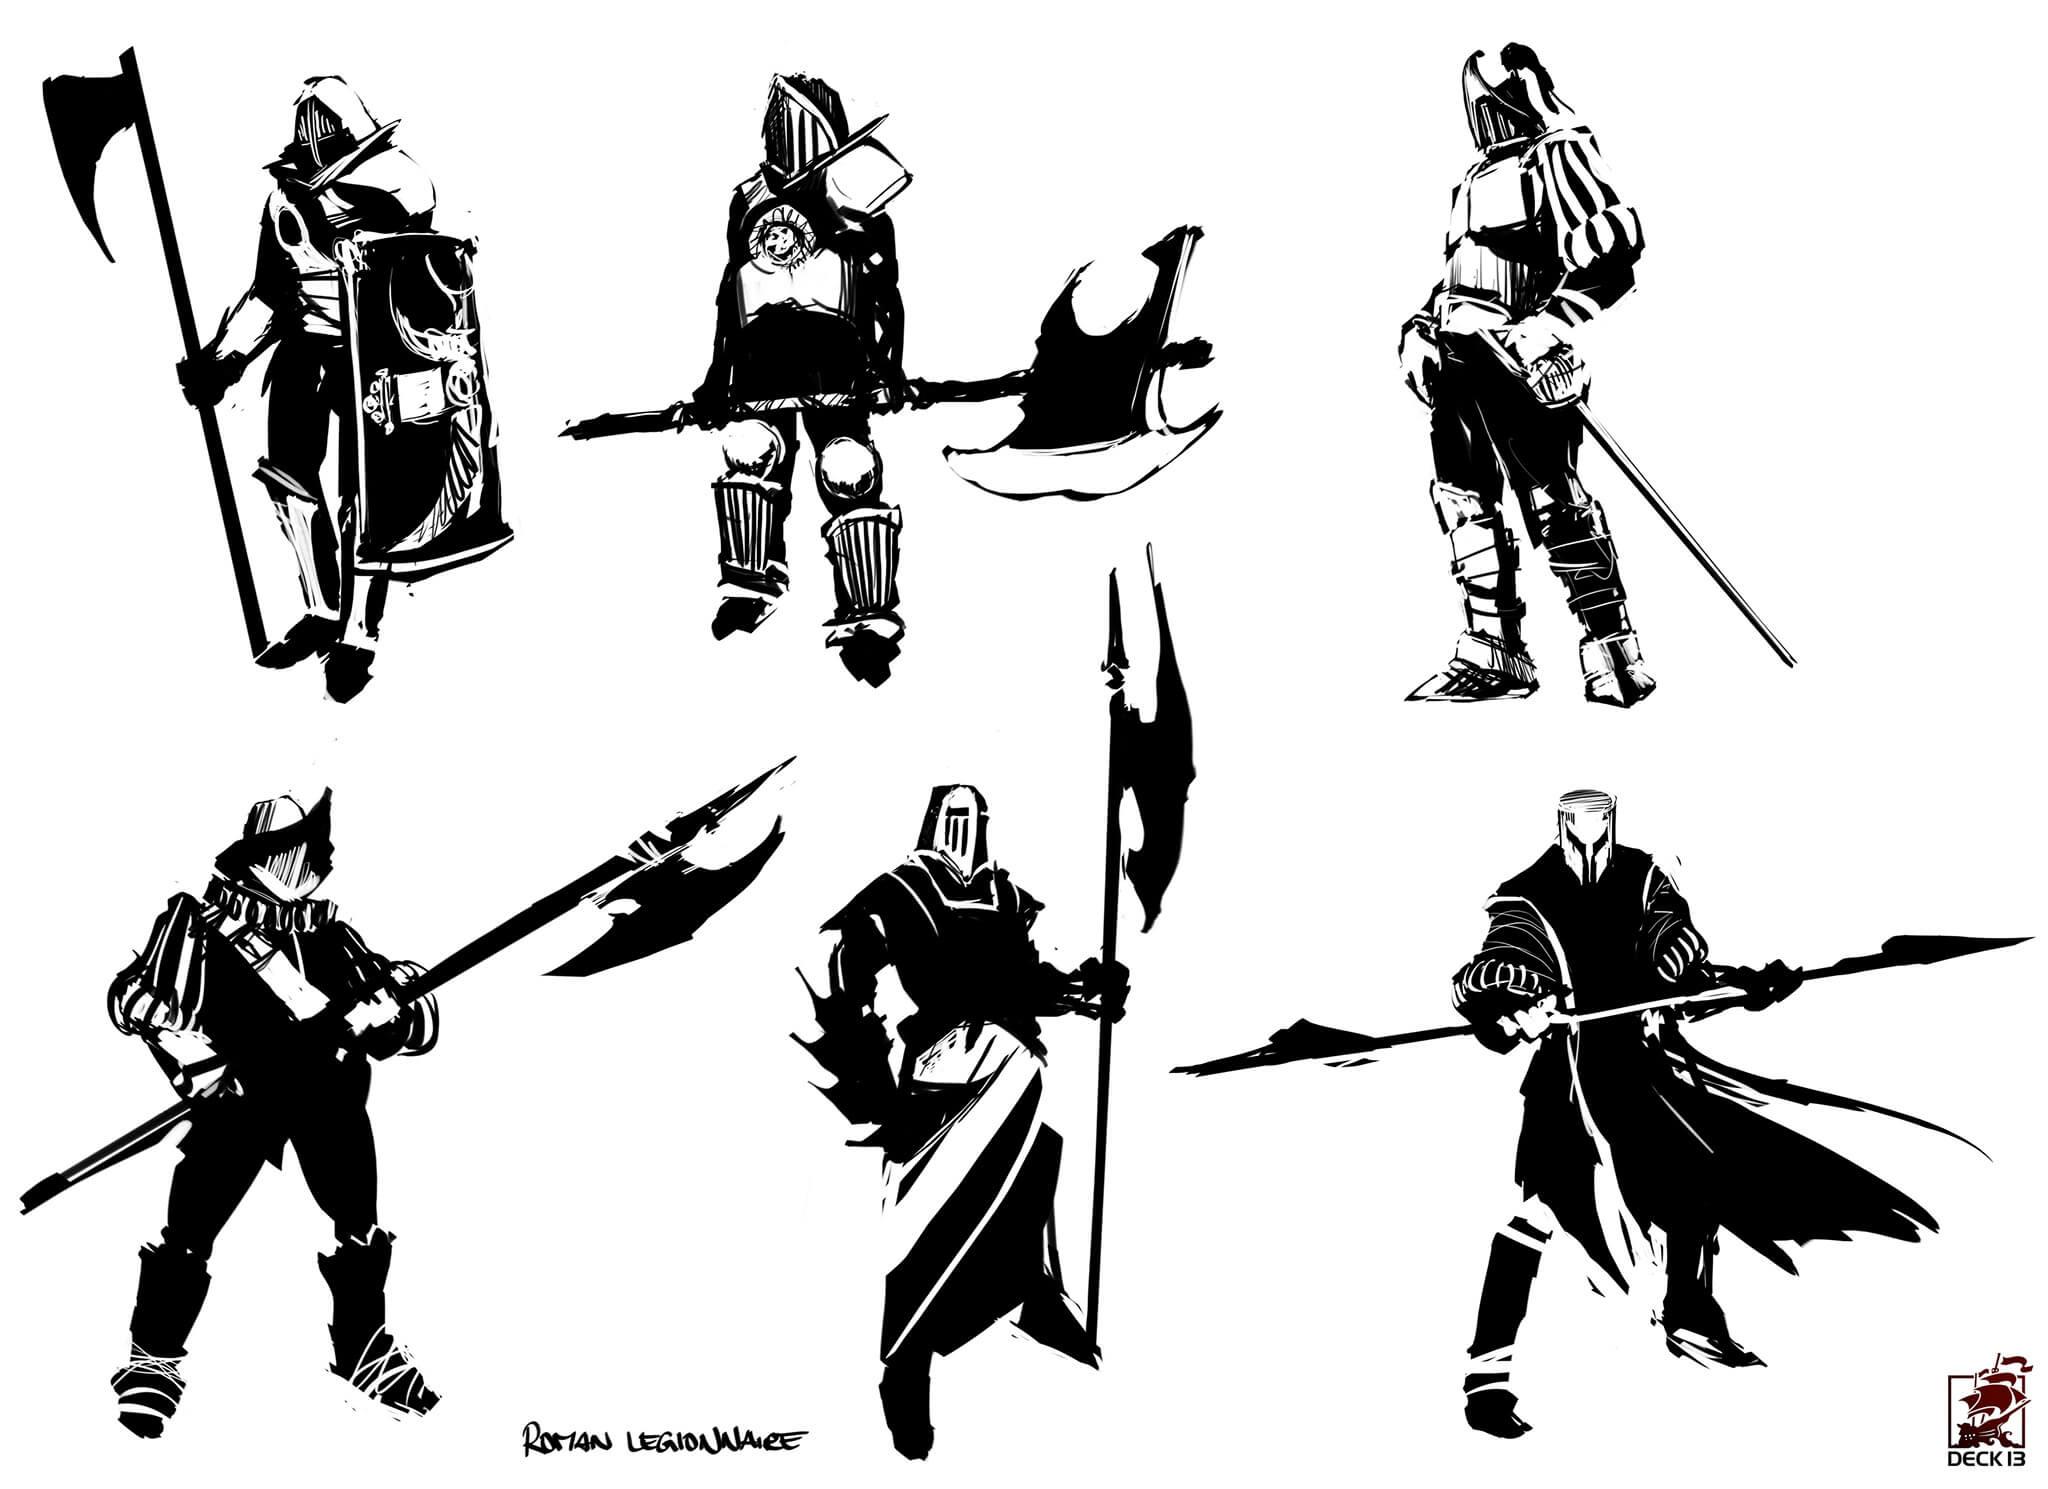 blood-knights-character-concept-art-felix-haas-roman_legionnaire_iteration_001